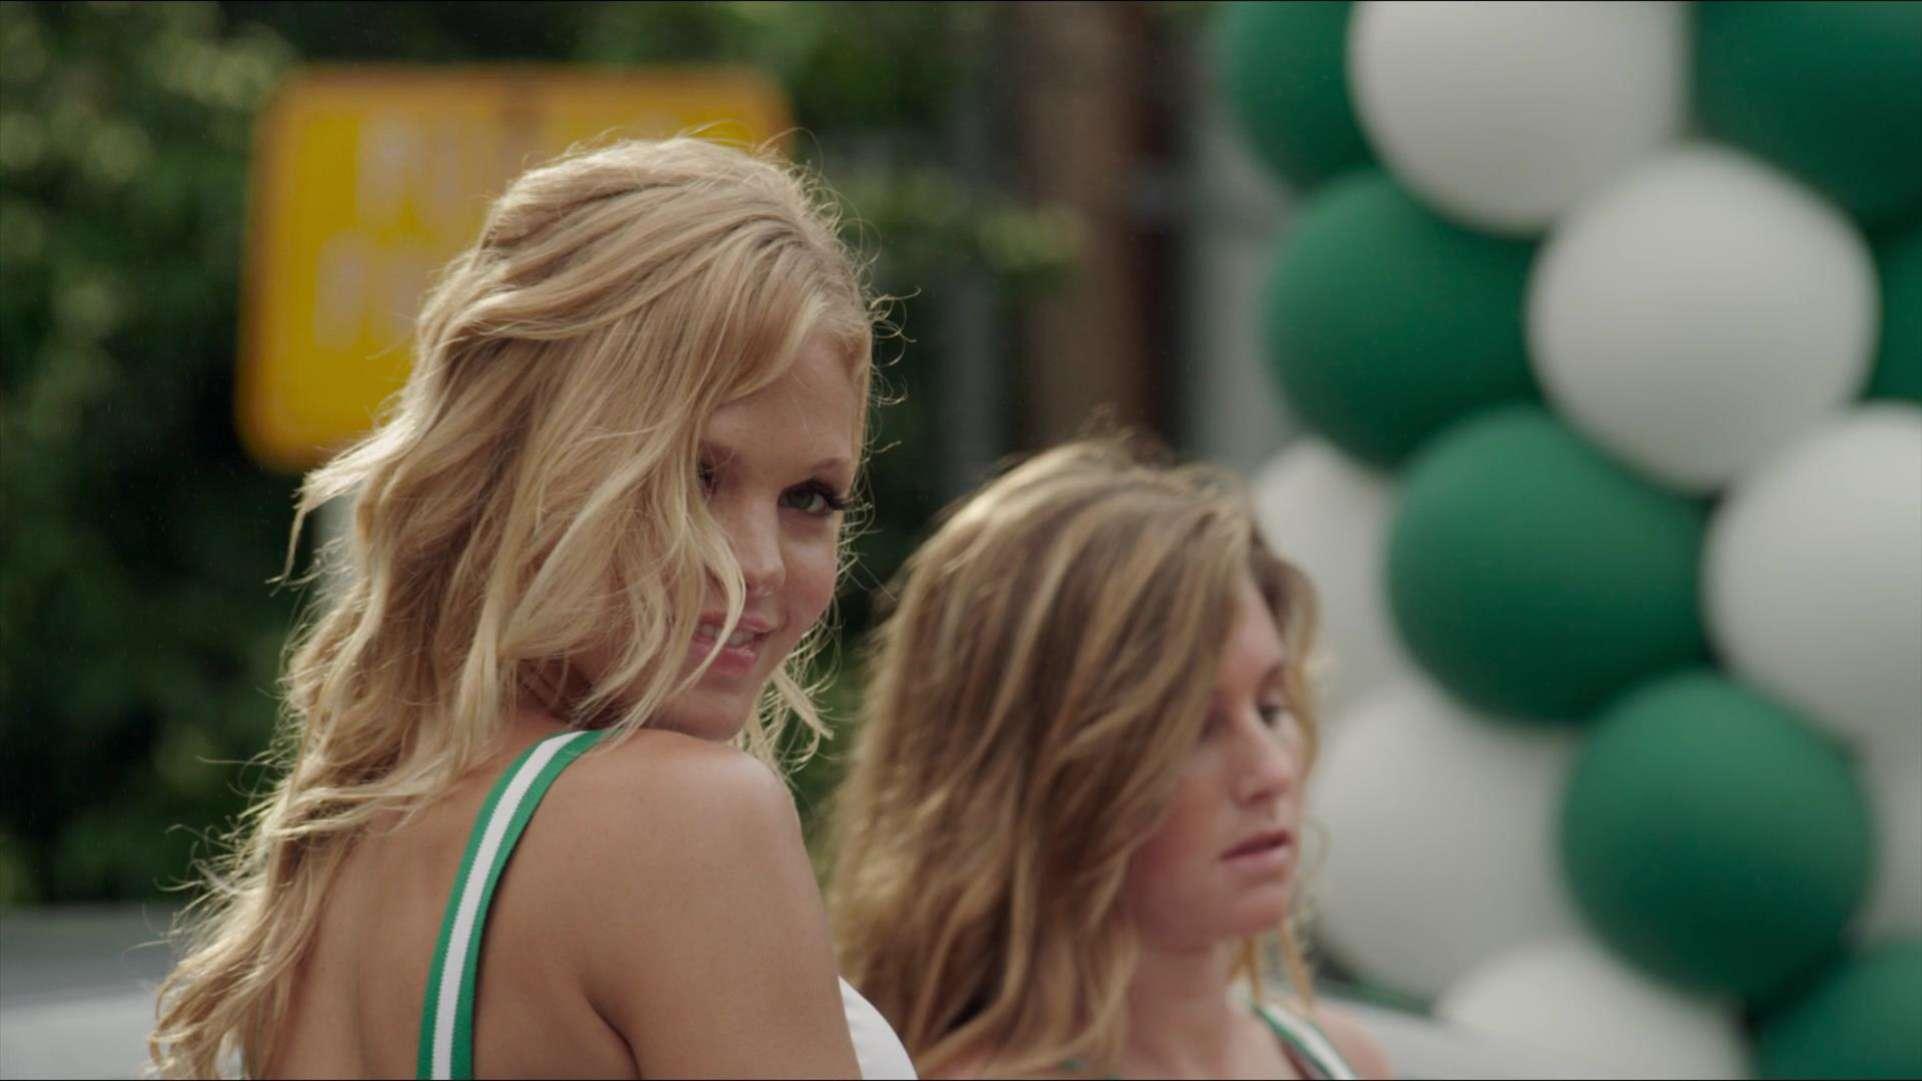 Erin Heatherton 2013 : Erin Heatherton Hot in Grown Ups 2-16